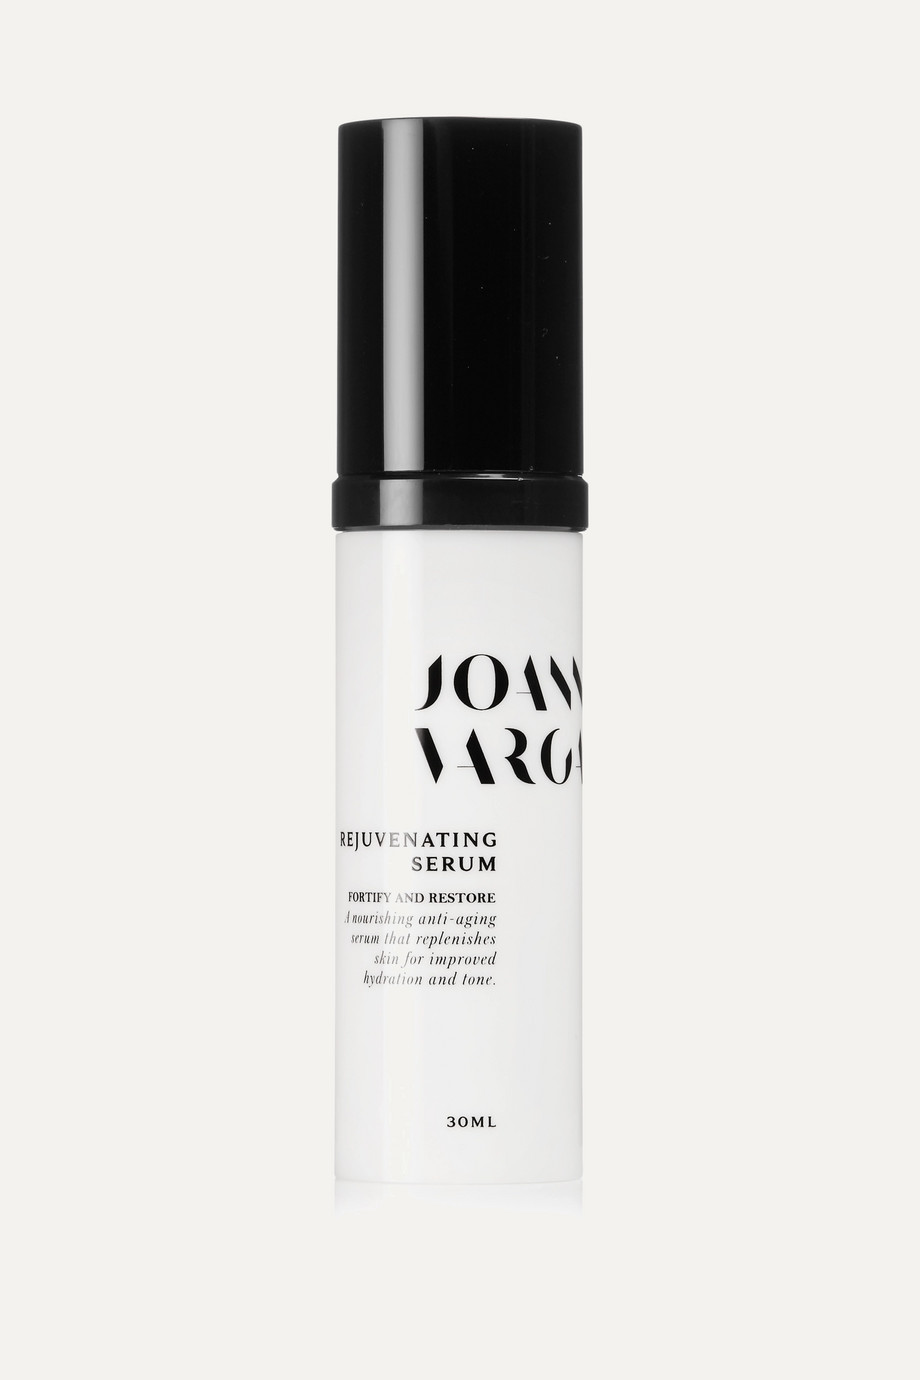 Joanna Vargas Rejuvenating Serum – 30 ml – Serum